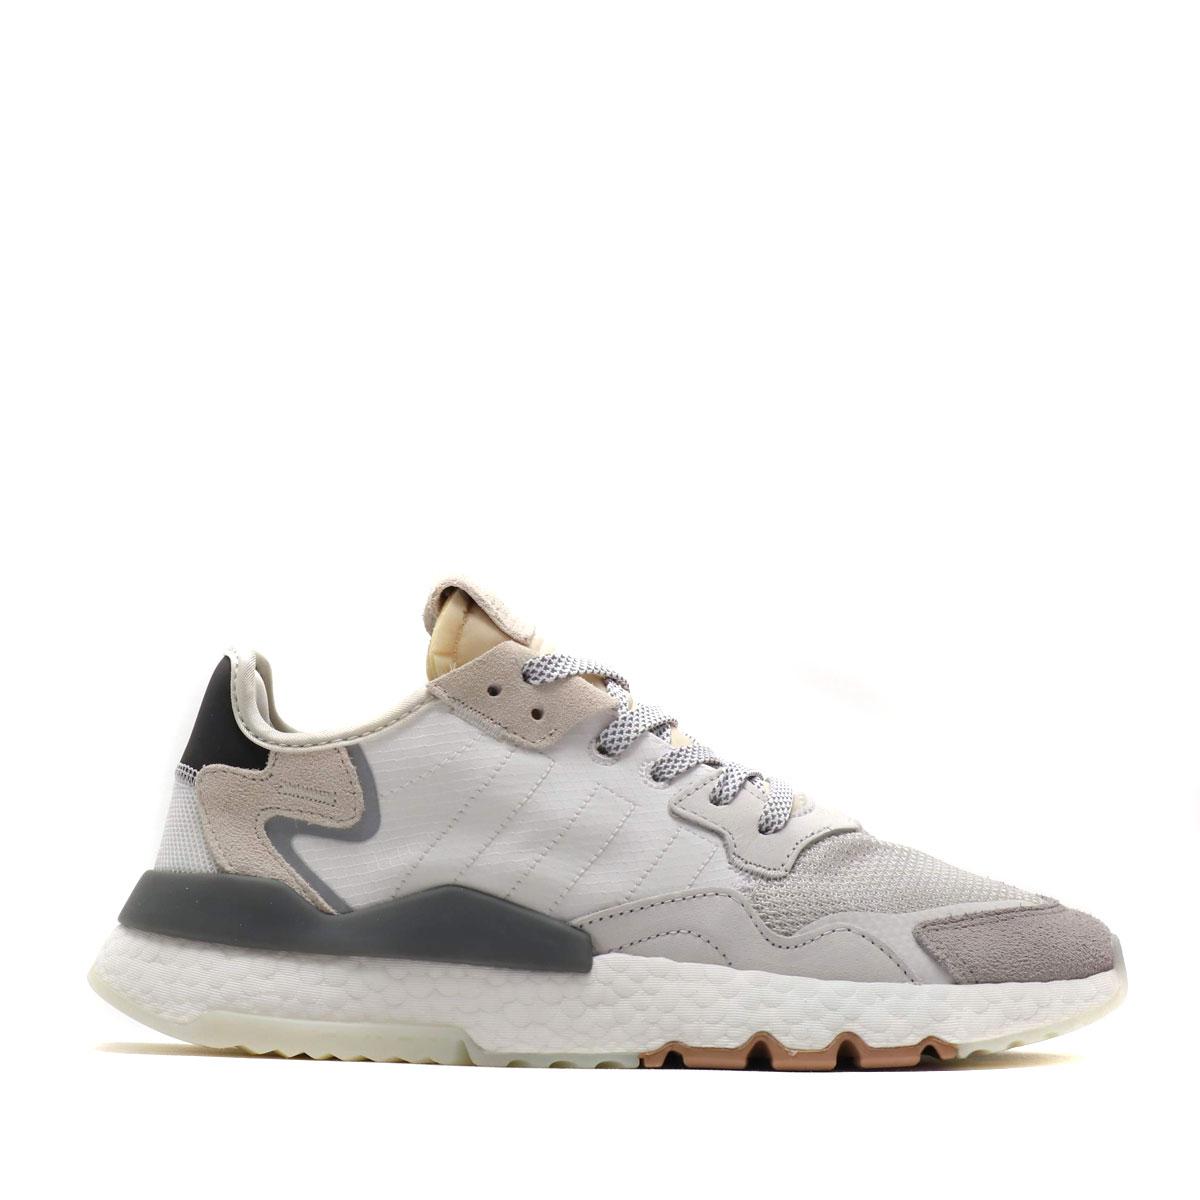 adidas Originals NITE JOGGER(RUNNING WHITE/CRYSTAL WHITE/CORE BLACK)(アディダスオリジナルス ナイト ジョガー)【メンズ】【レディース】【スニーカー】【19SS-I】